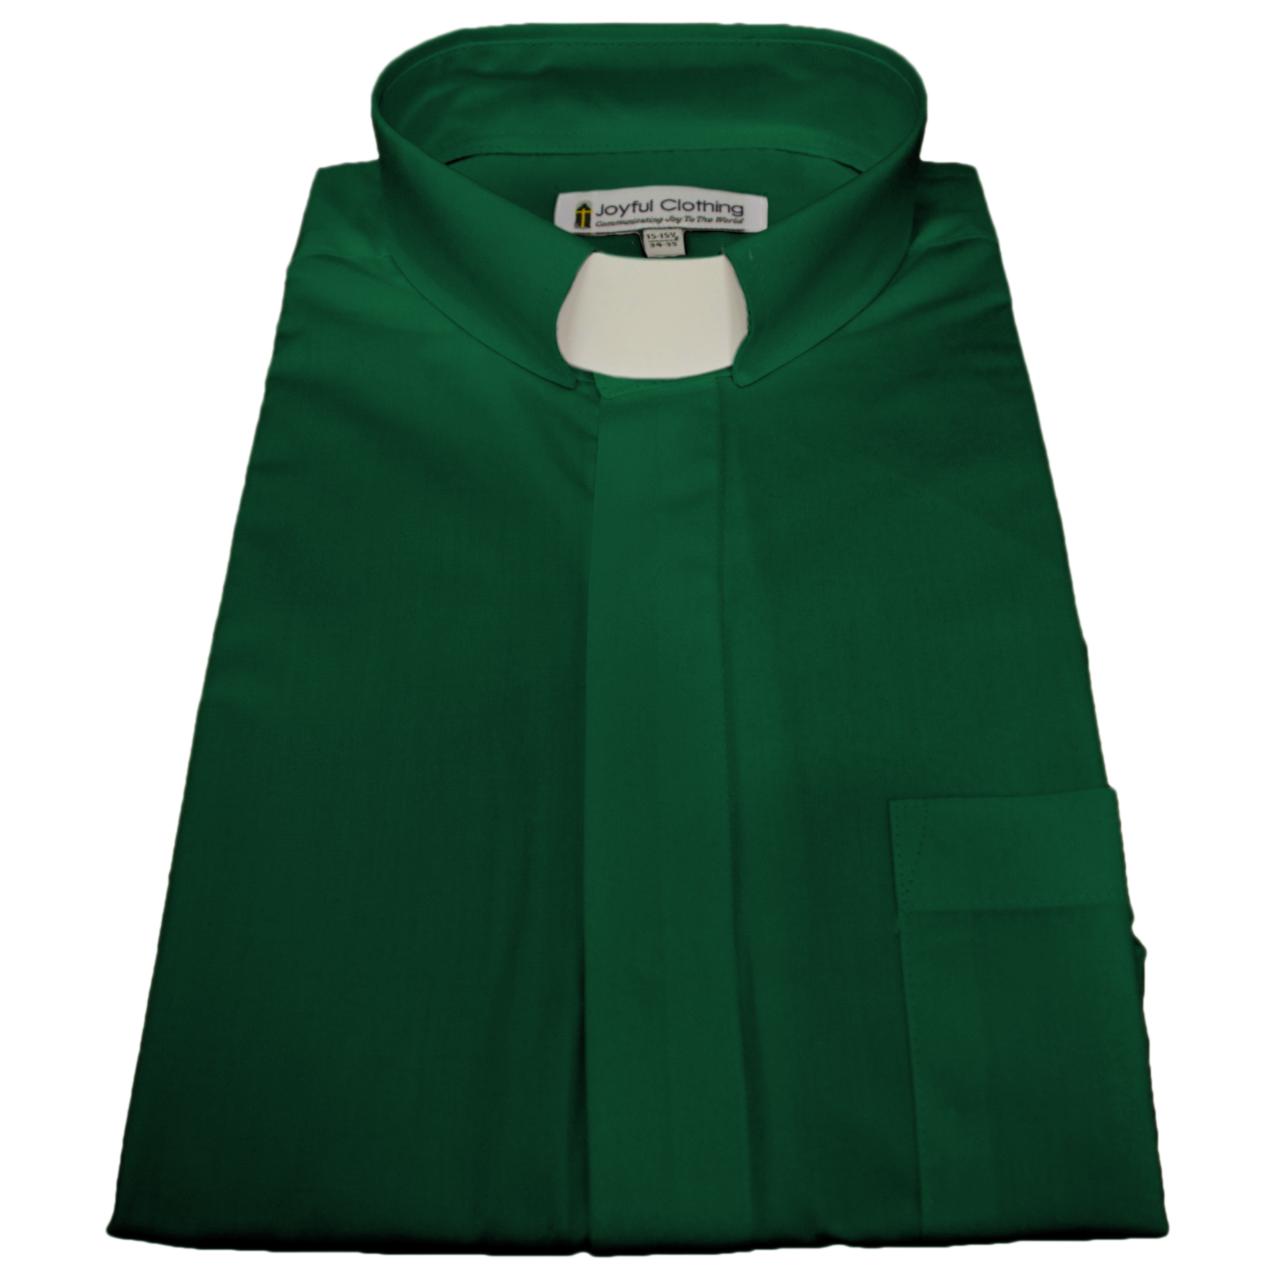 125. Men's Long-Sleeve Tab-Collar Clergy Shirt - Kelly Green